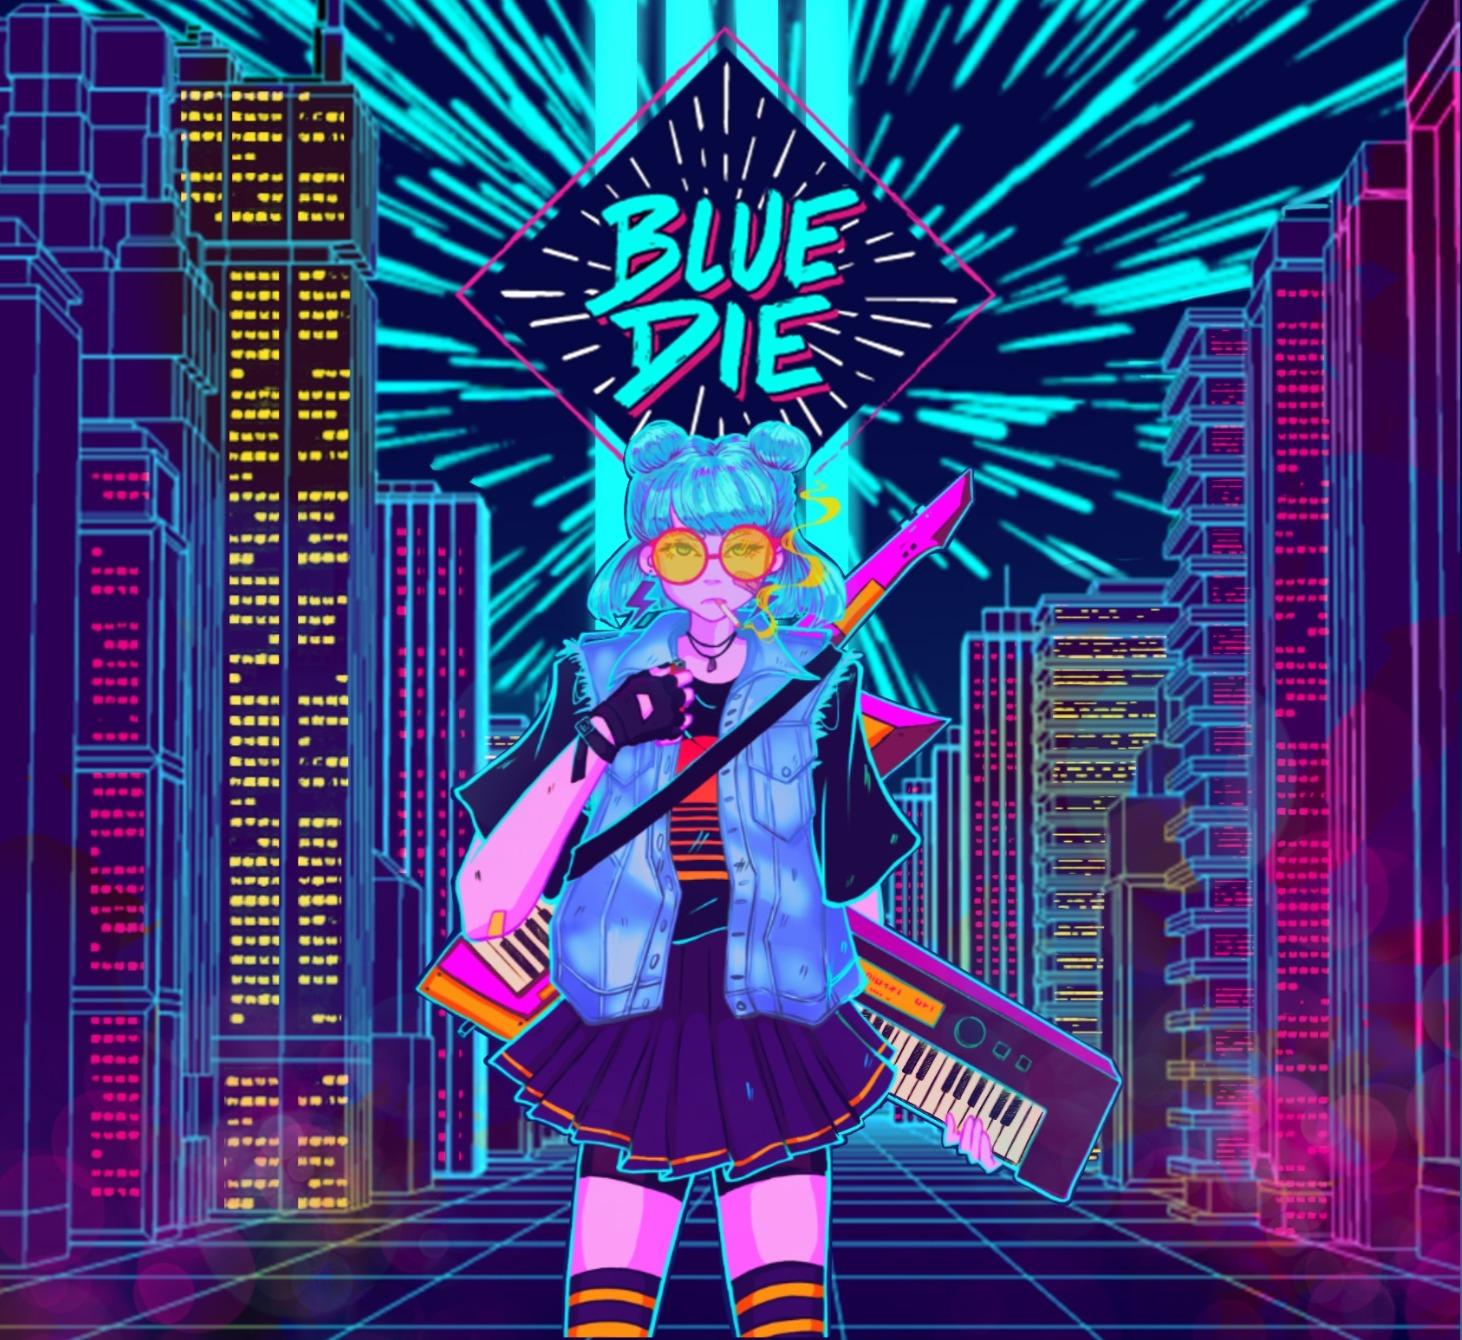 Blue Die Album Front Cover